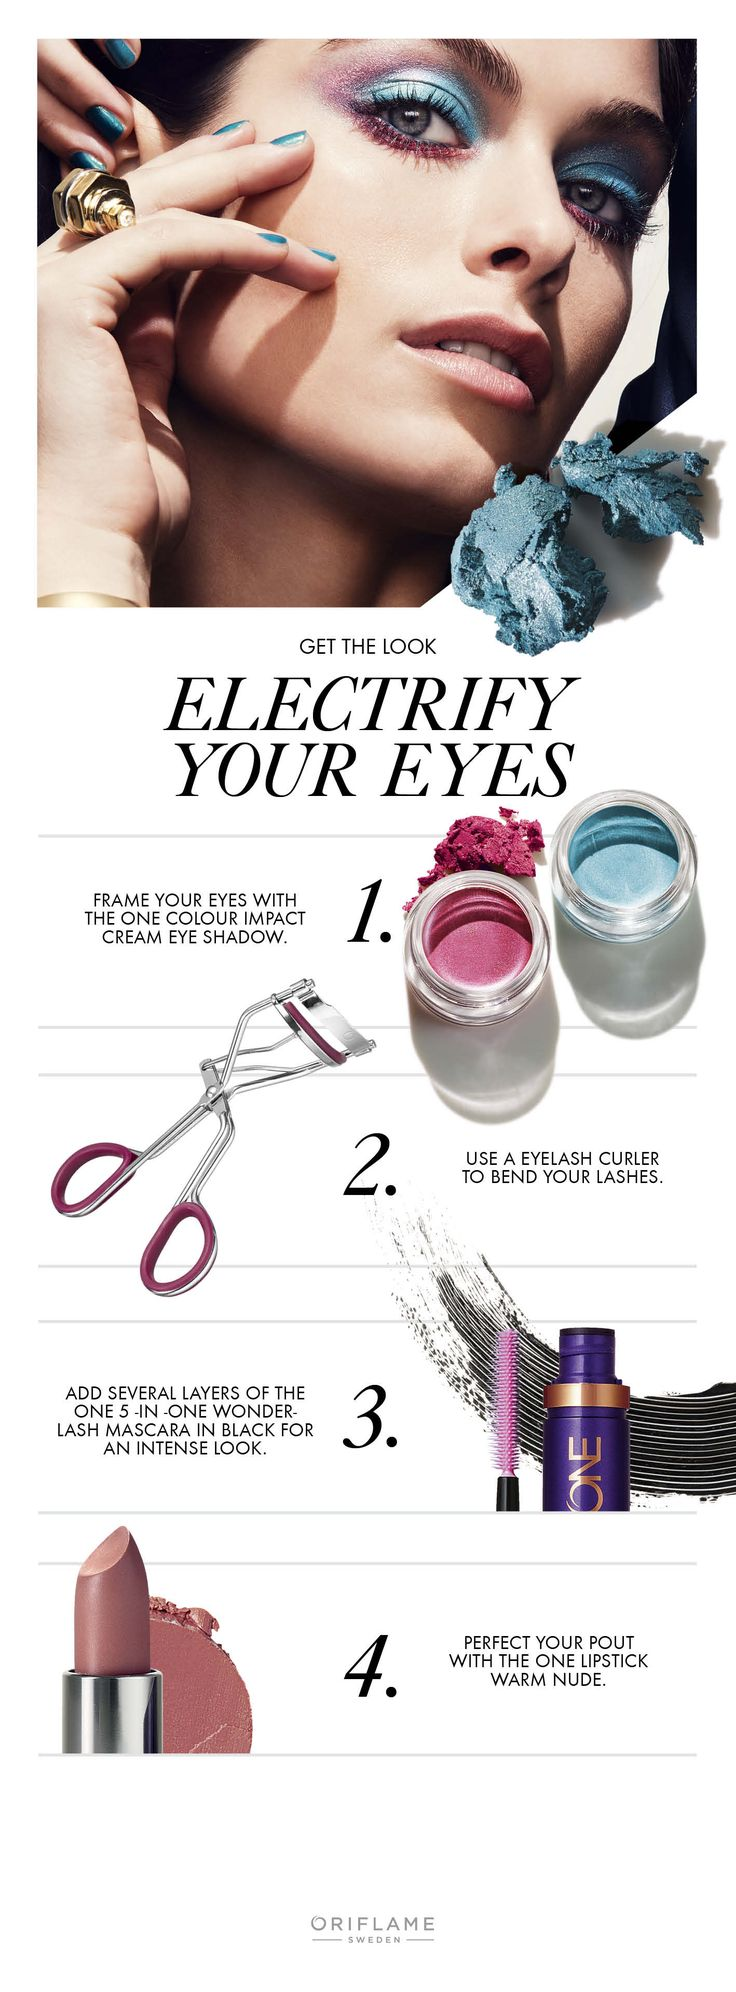 Electrify your eyes! #getthelook #oriflame - https://www.facebook.com/TienditadeBellezaLaguna/